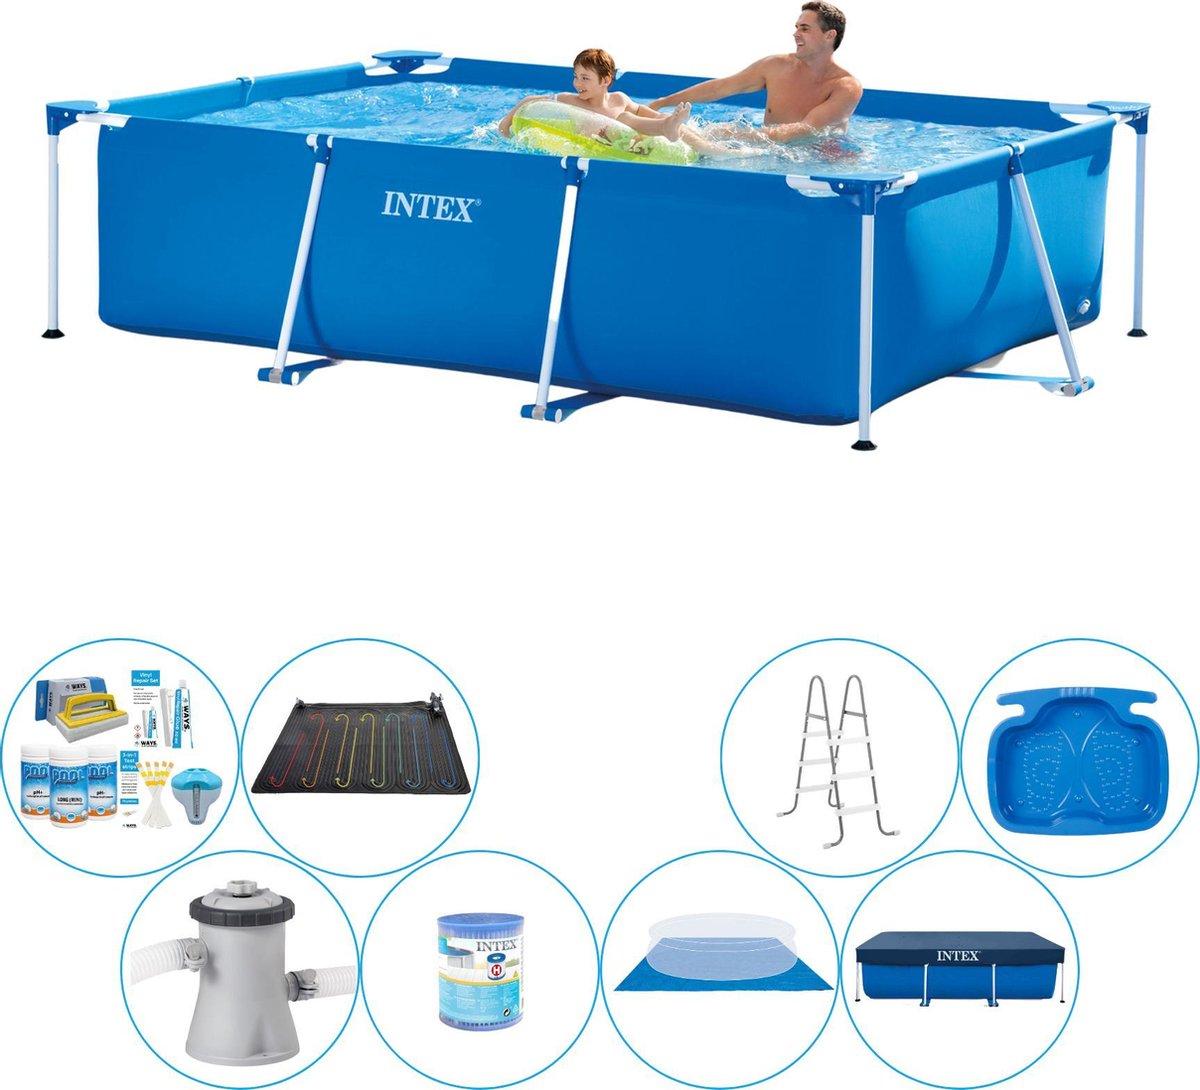 Intex Frame Pool Rechthoekig 260x160x65 cm - Zwembad Super Deal